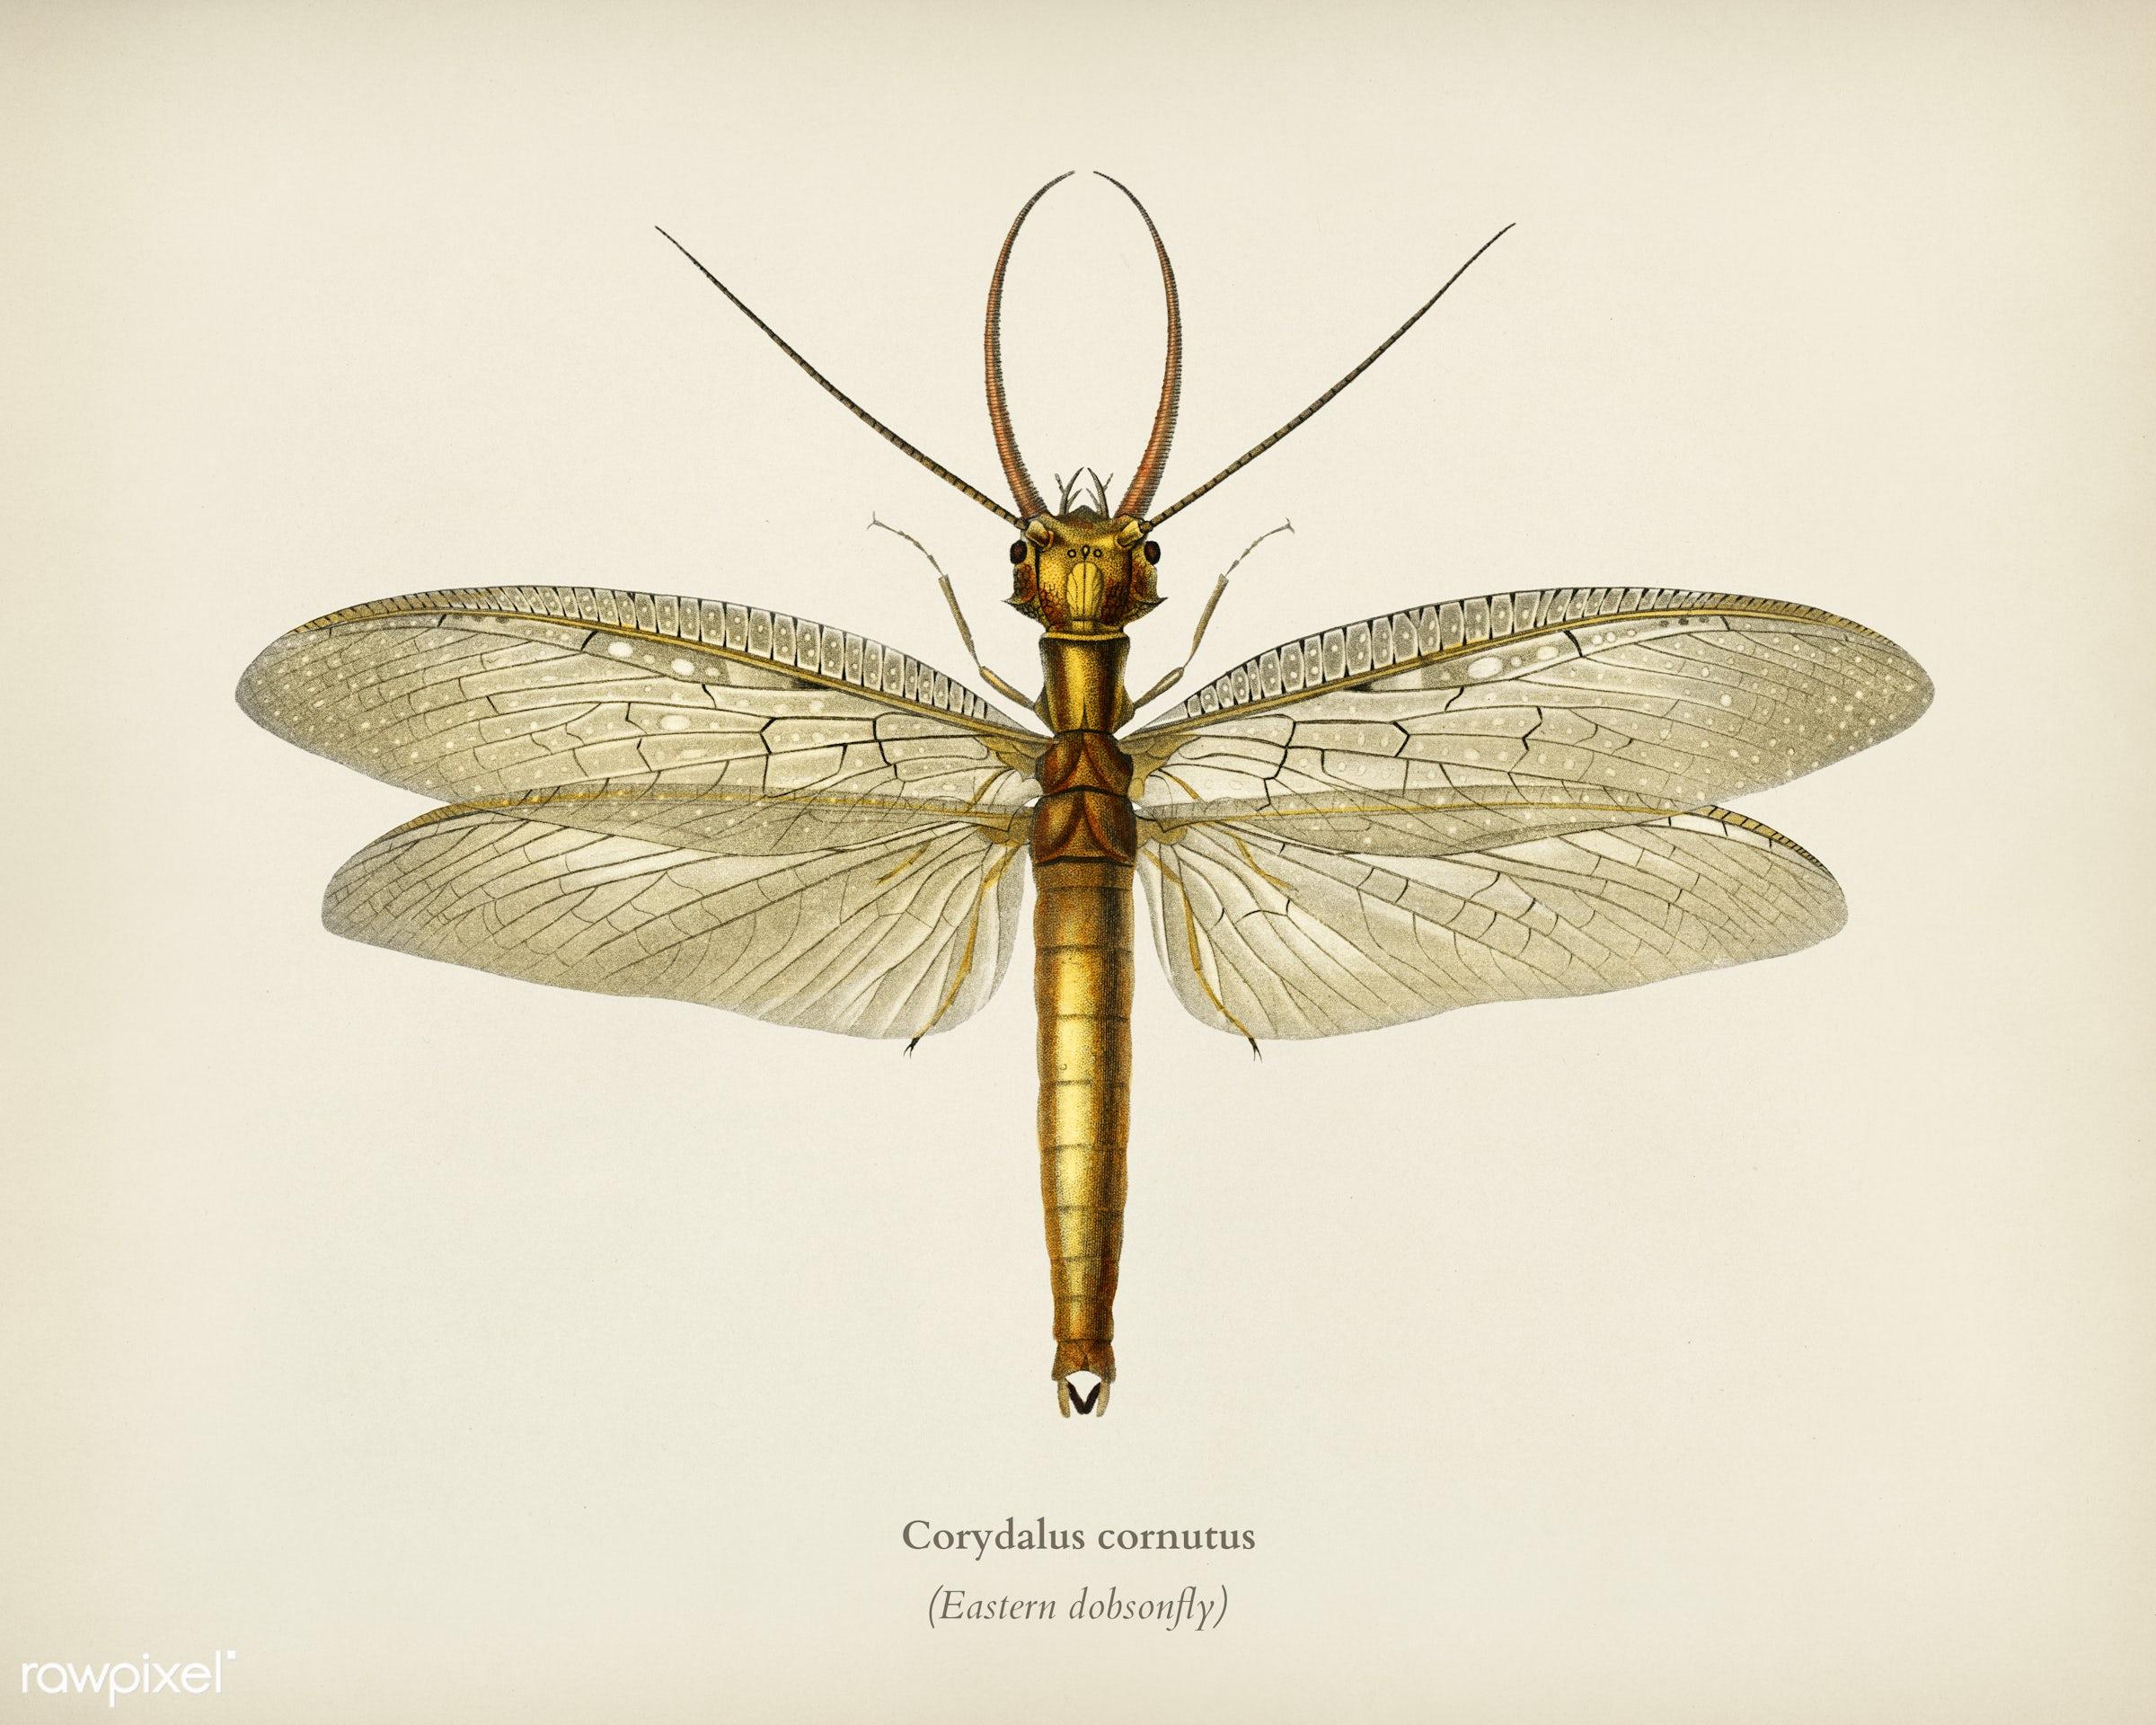 Eastern dobsonfly (Corydalus cornutus) illustrated by Charles Dessalines D' Orbigny (1806-1876). Digitally enhanced from...